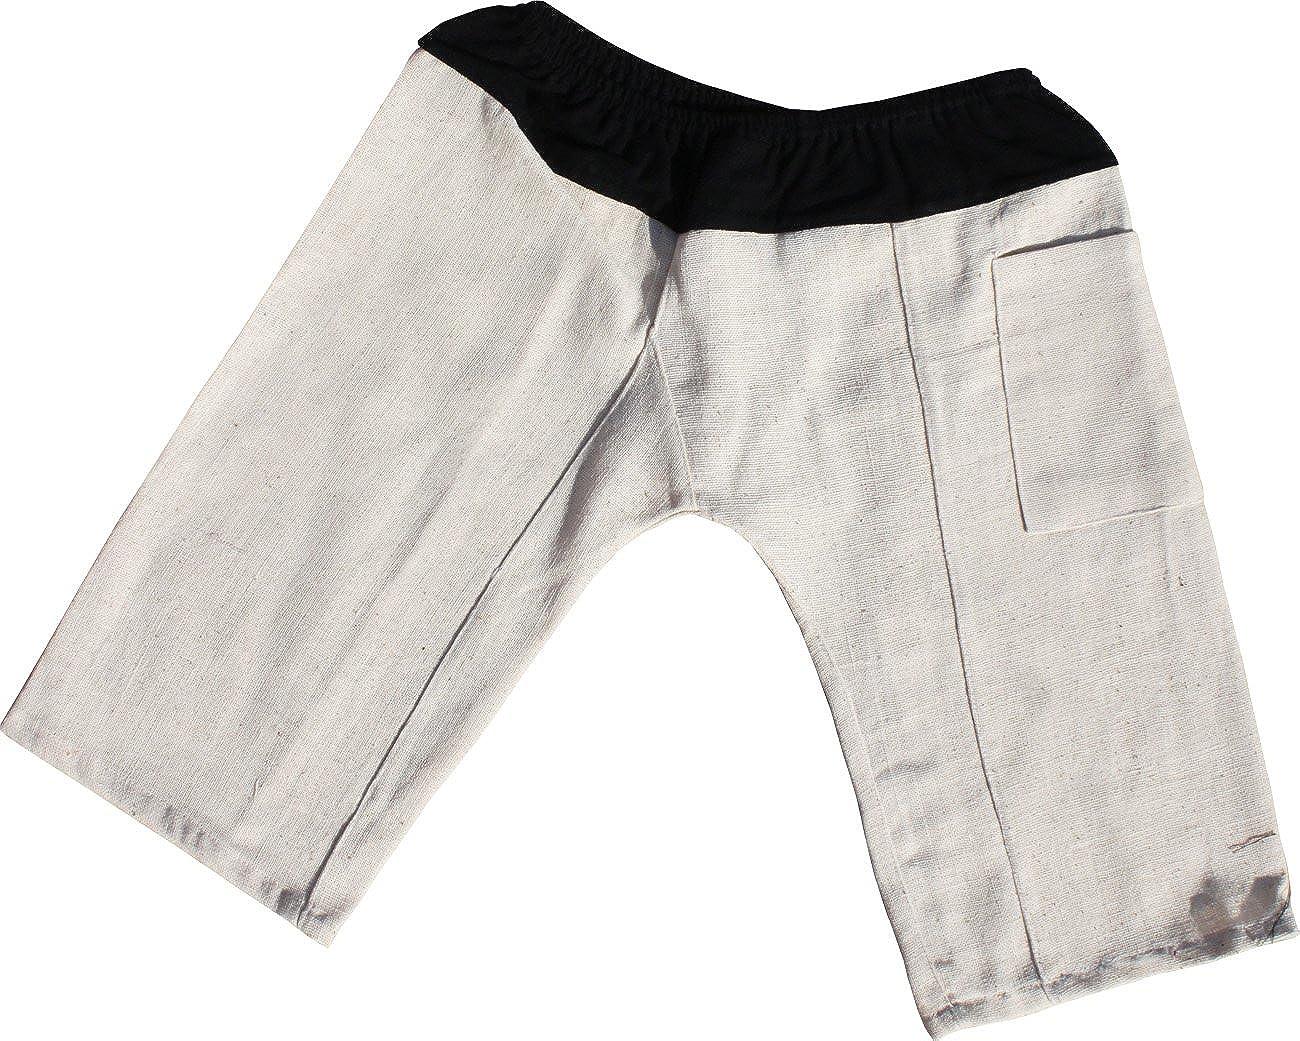 Raan Pah Muang RaanPahMuang Thick Handewoven Hum Cotton Childrens Baggy Elastic Waist Pants variant25570AMZ